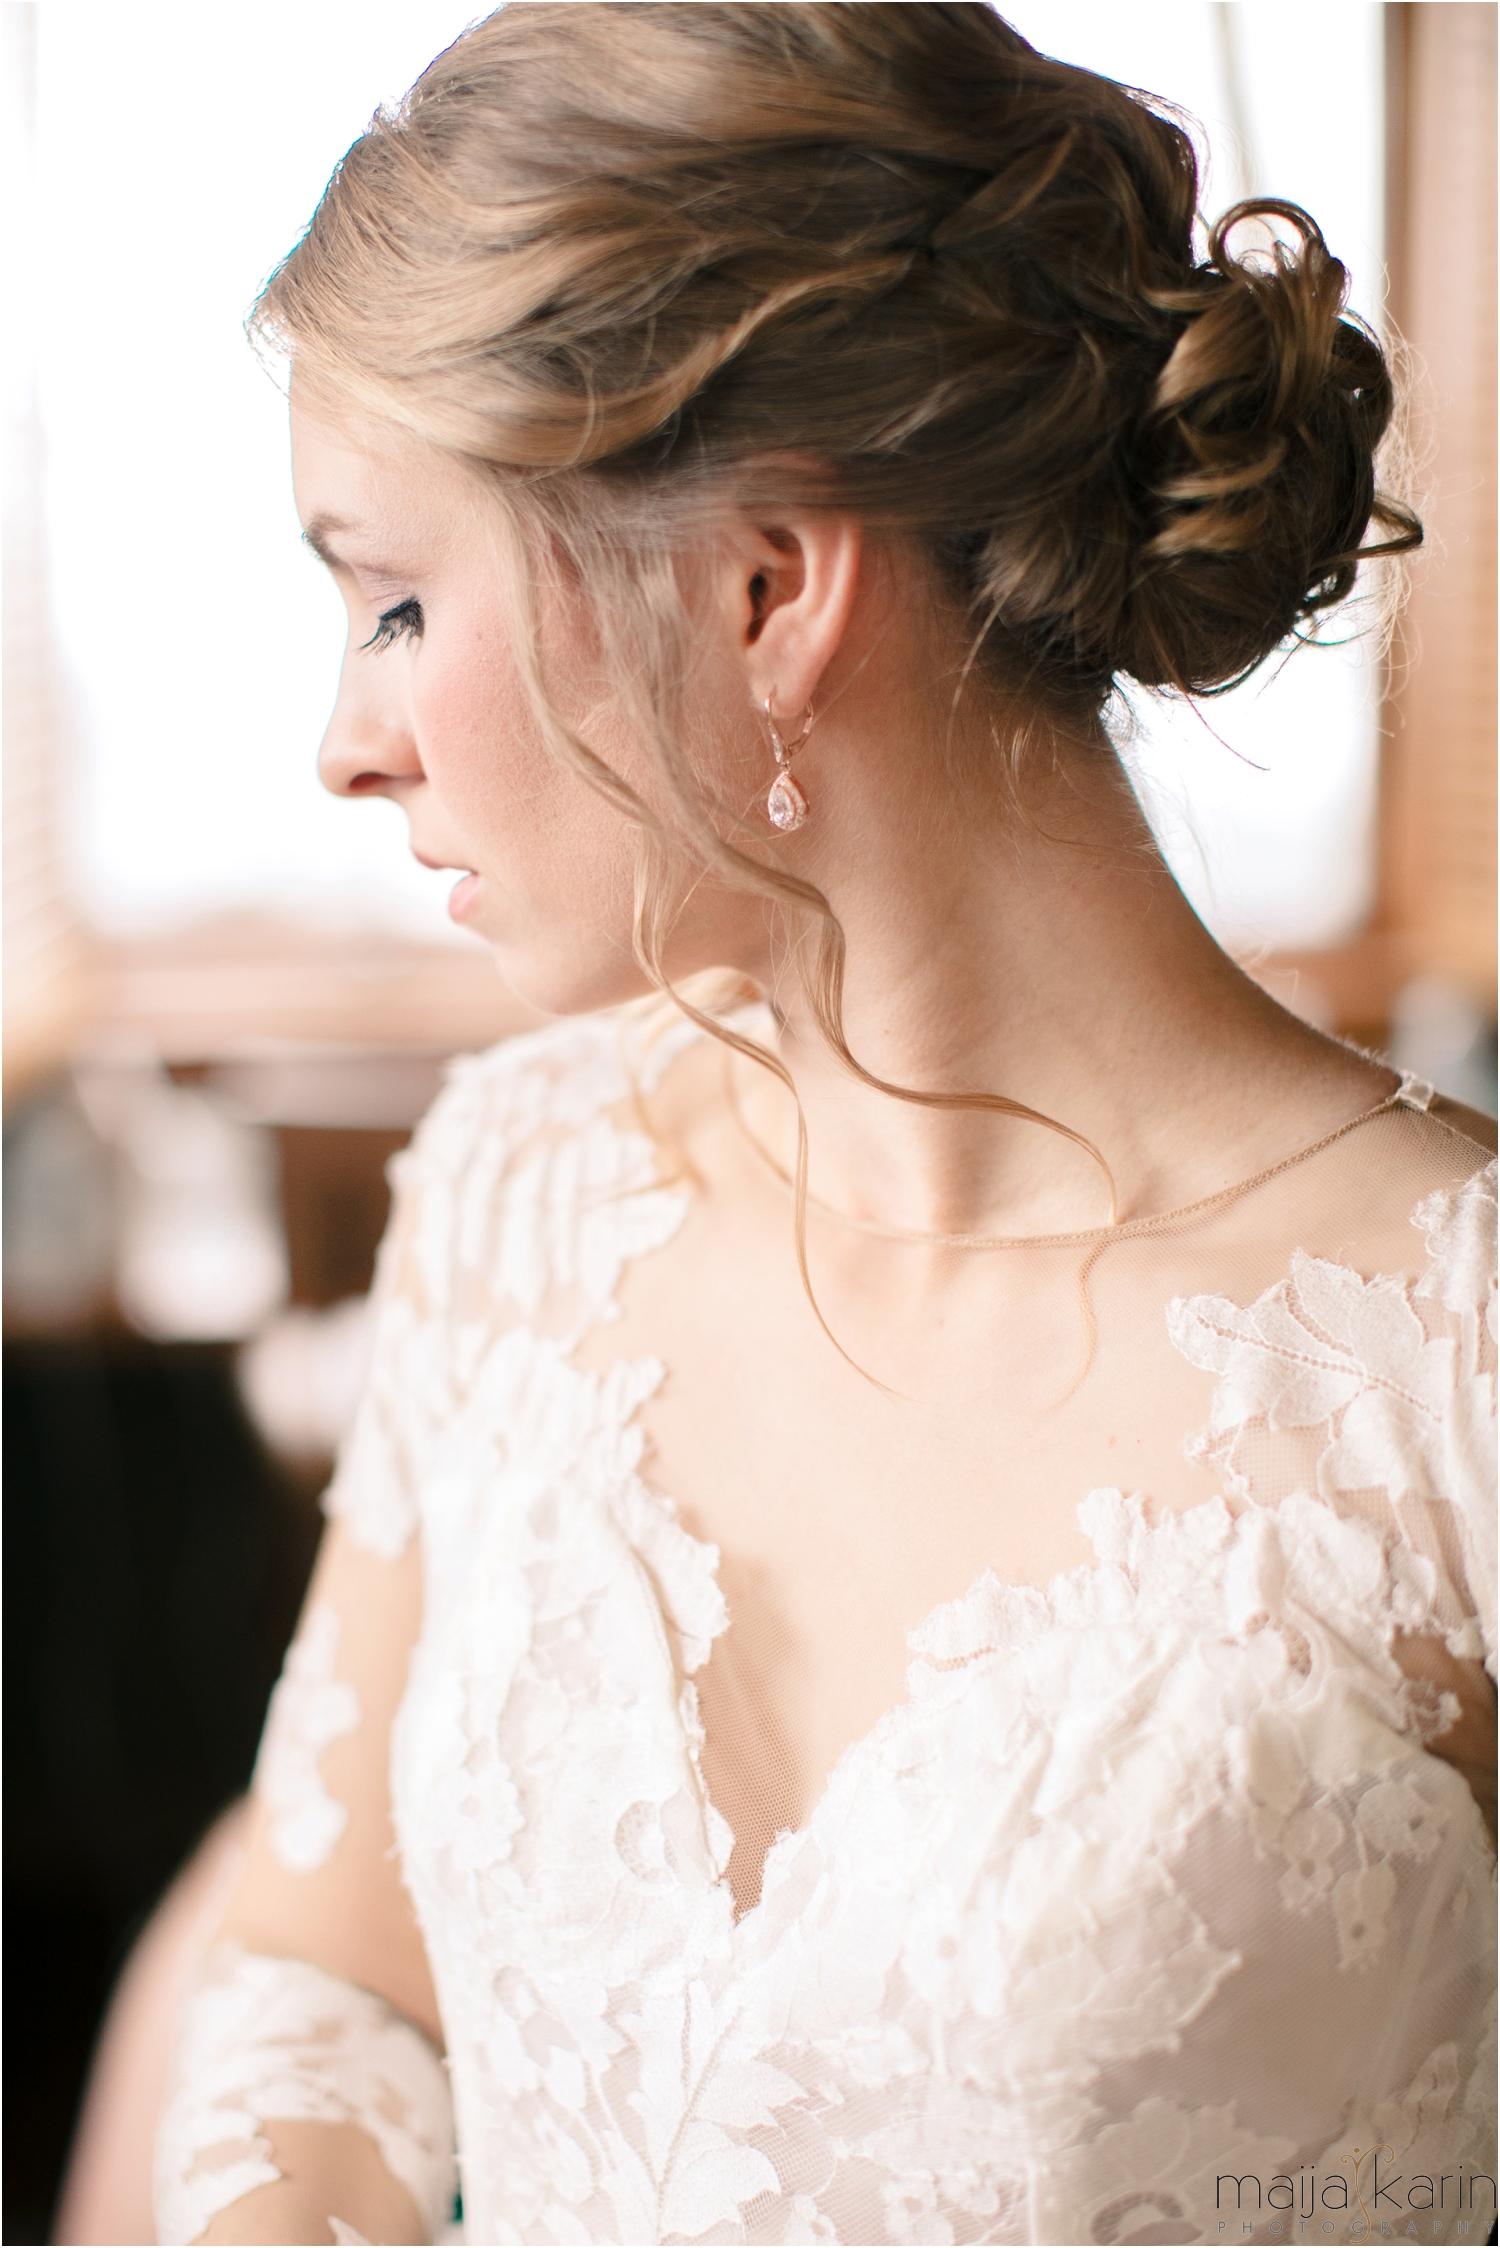 Stree-free-wedding-guide-maija-karin-photography22.jpg